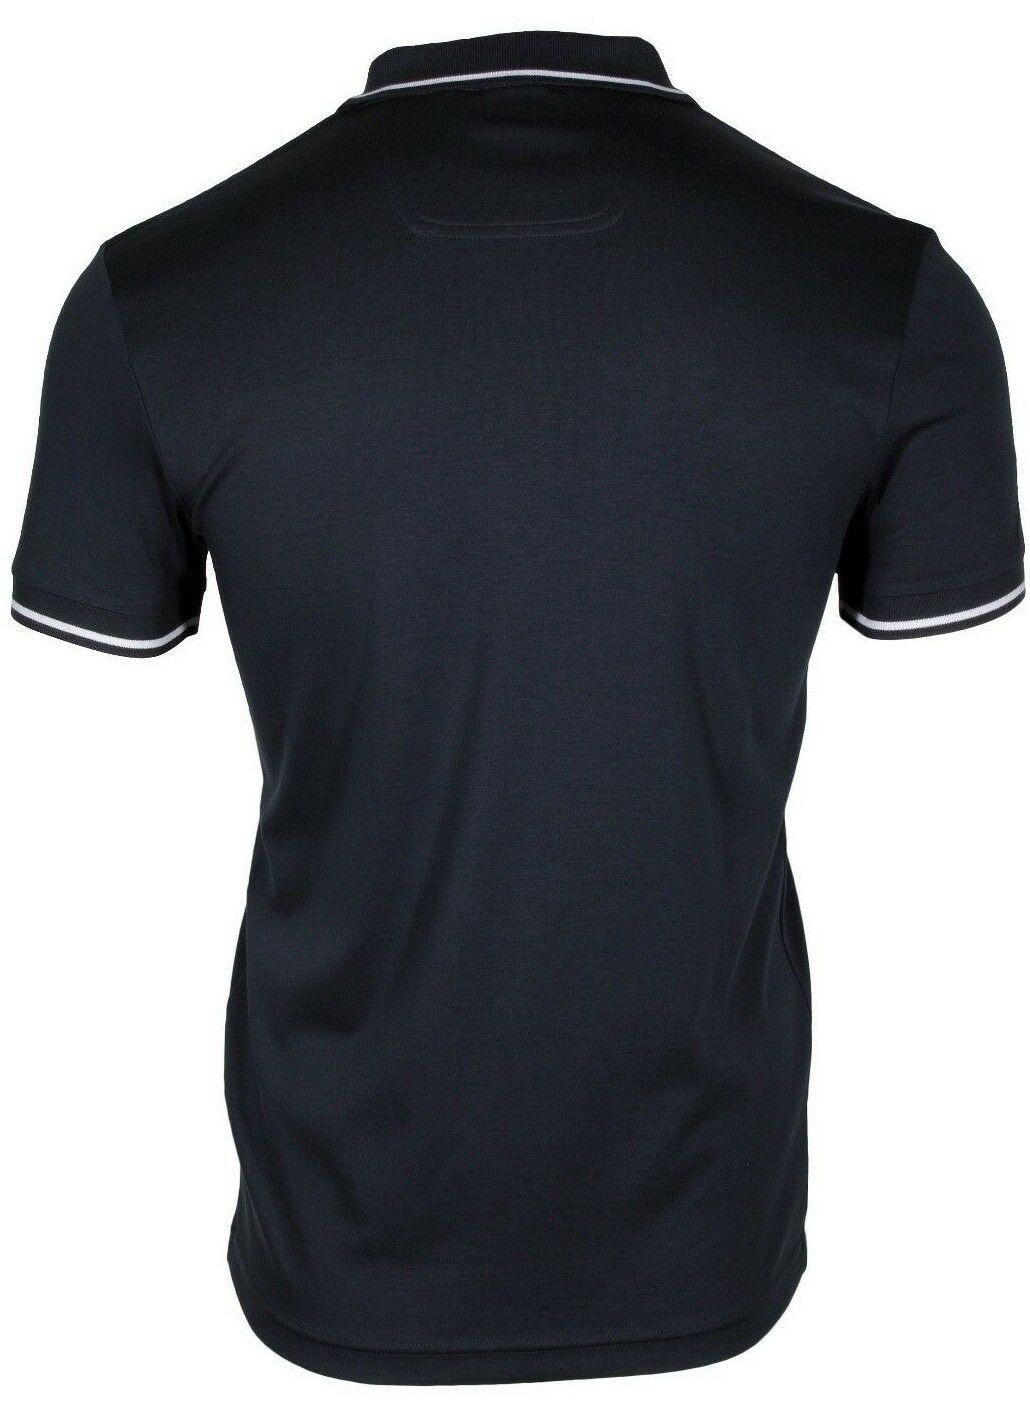 HUGO-BOSS-Paule-1-Men-039-s-Short-Sleeve-Slim-Fit-Polo-Shirt-Navy-50399450-410 thumbnail 6